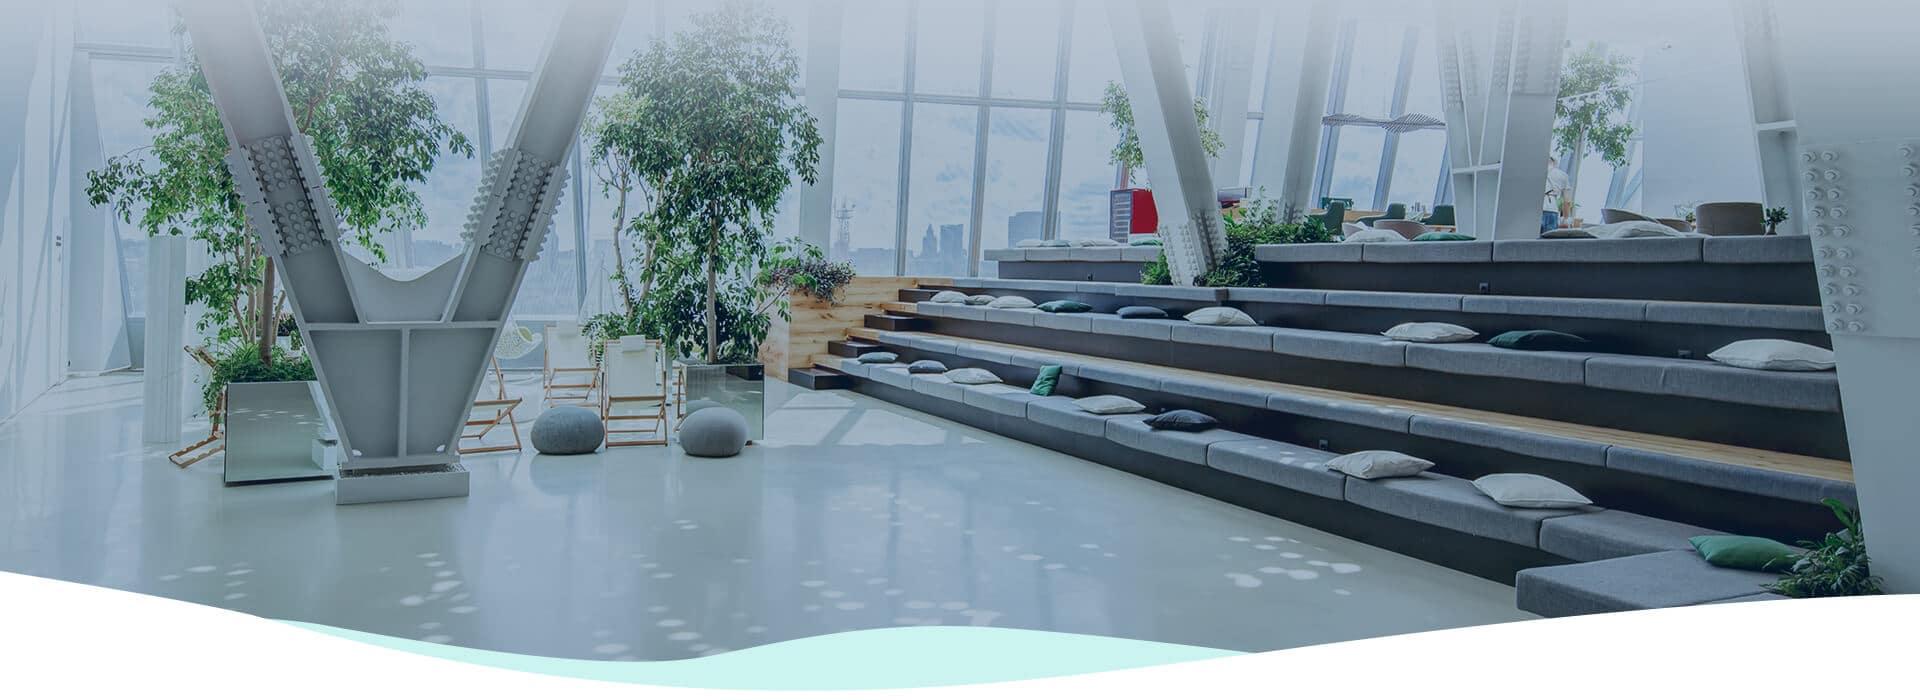 entretient-generale-nettoyage-activa-societe-nettoyage-Carli-Bruxelles